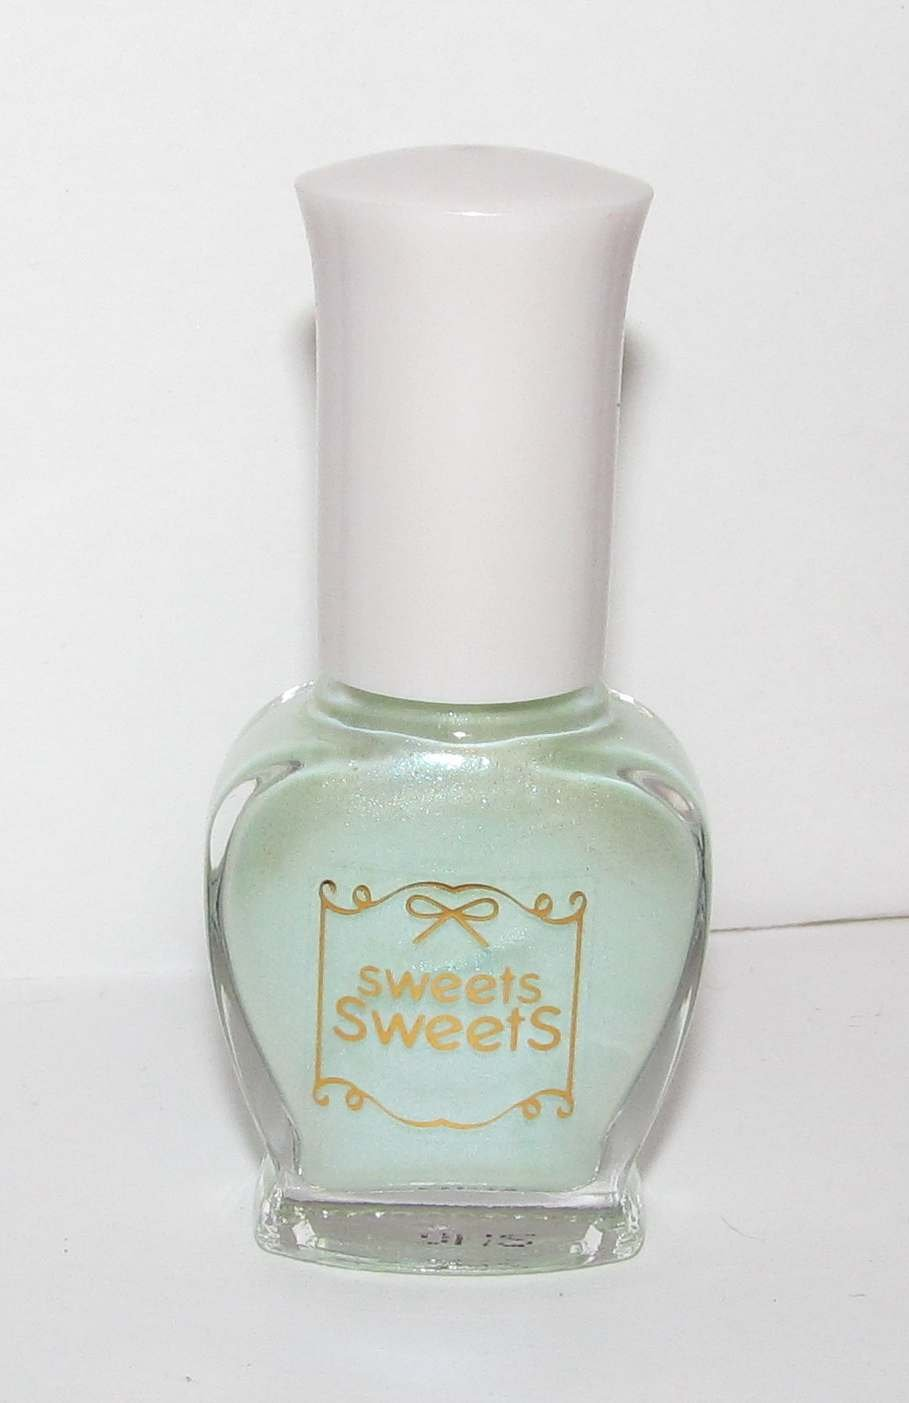 Sweets Sweets Nail Polish - Nice Mint Green Color